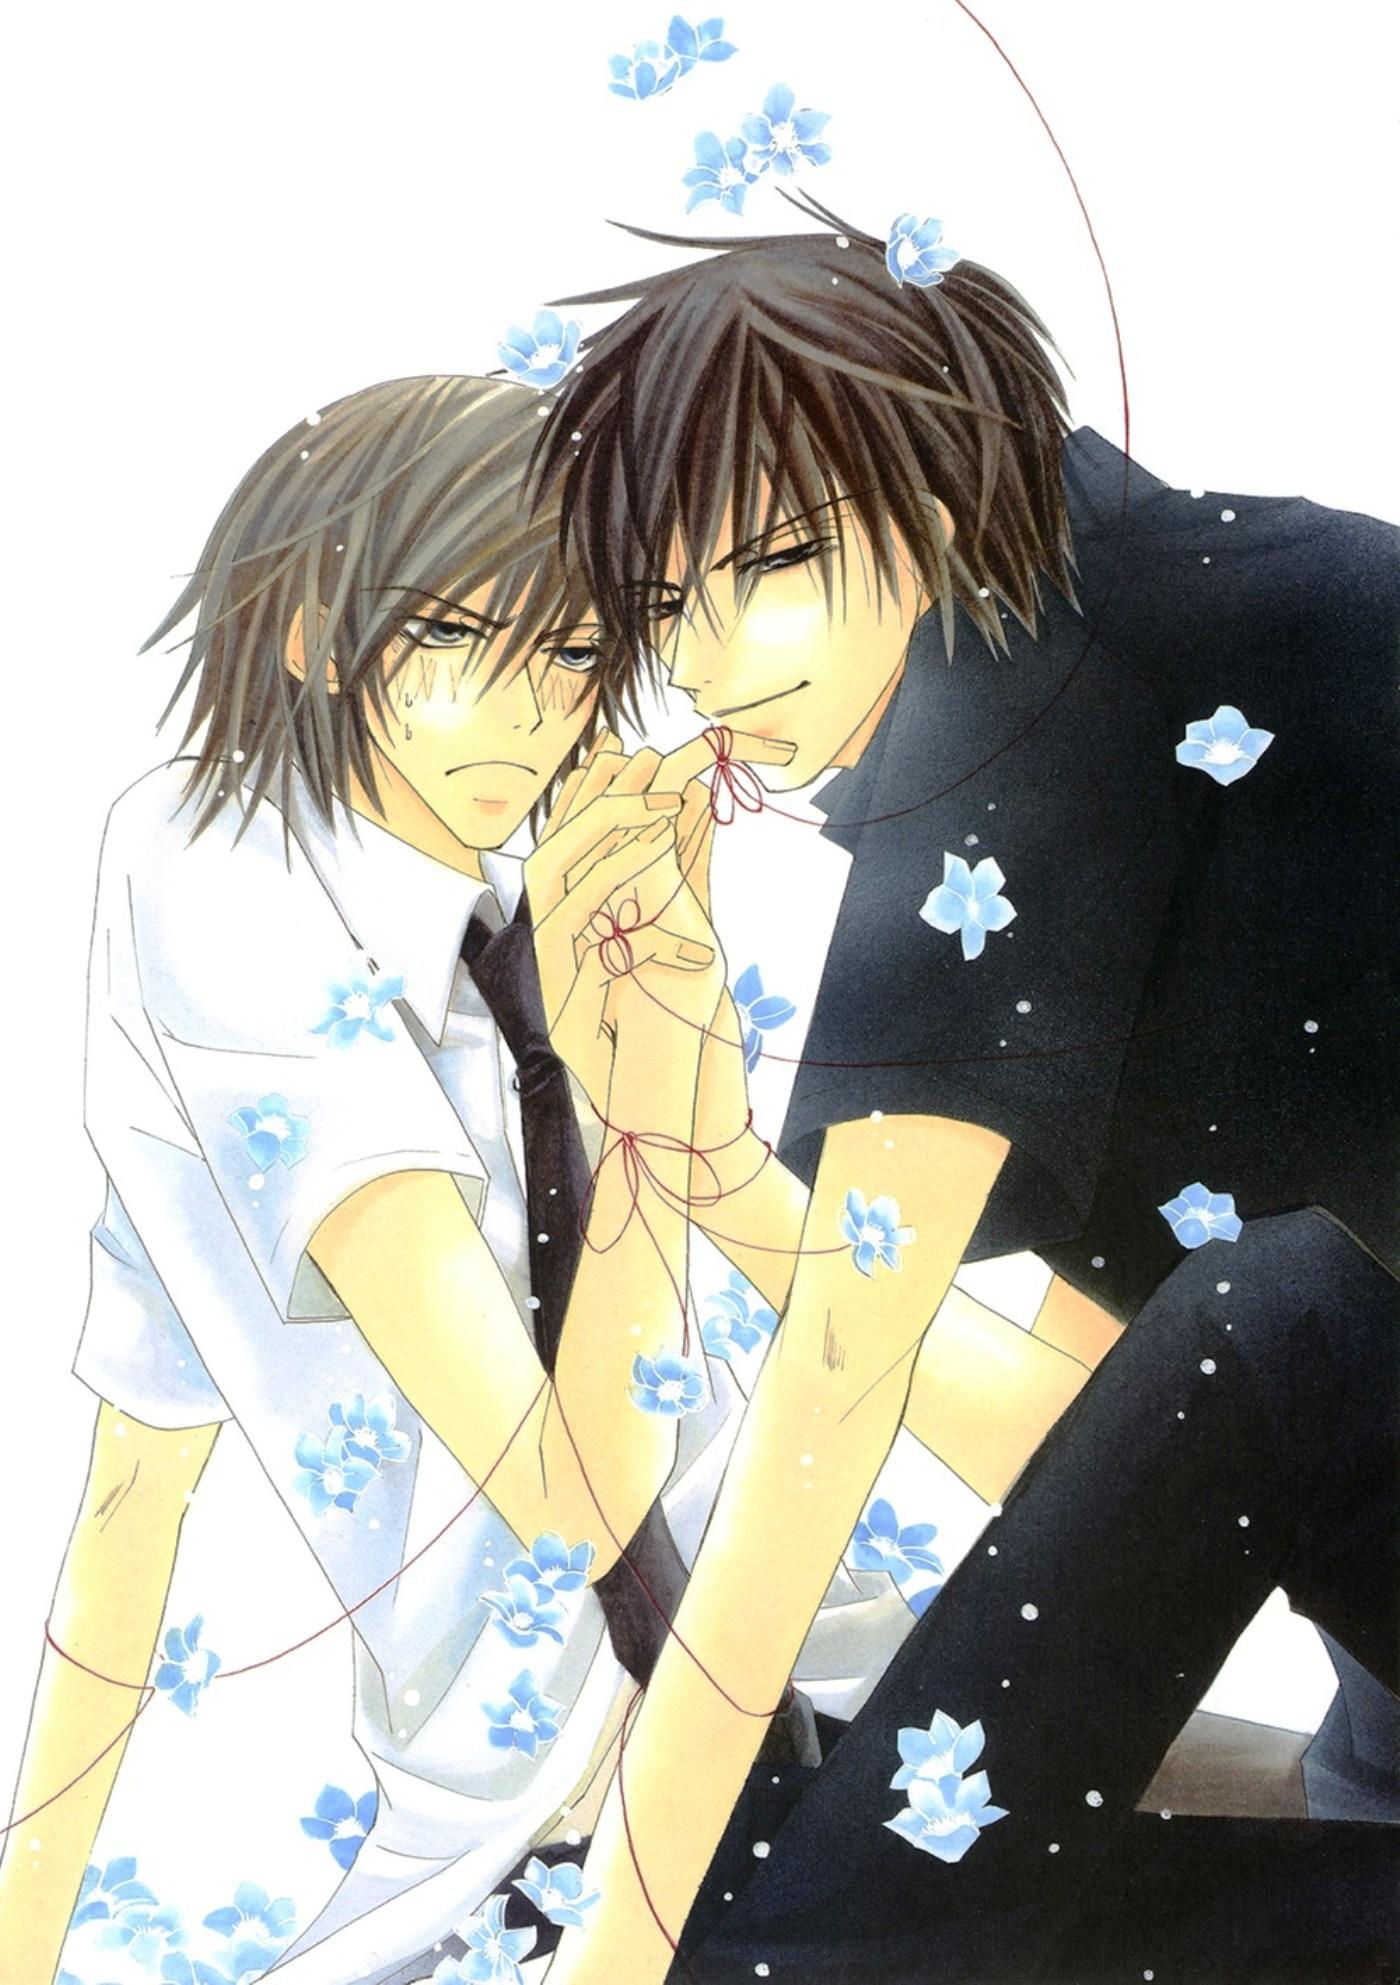 Junjou Romantica Mobile Wallpaper #137809 - Zerochan Anime ...